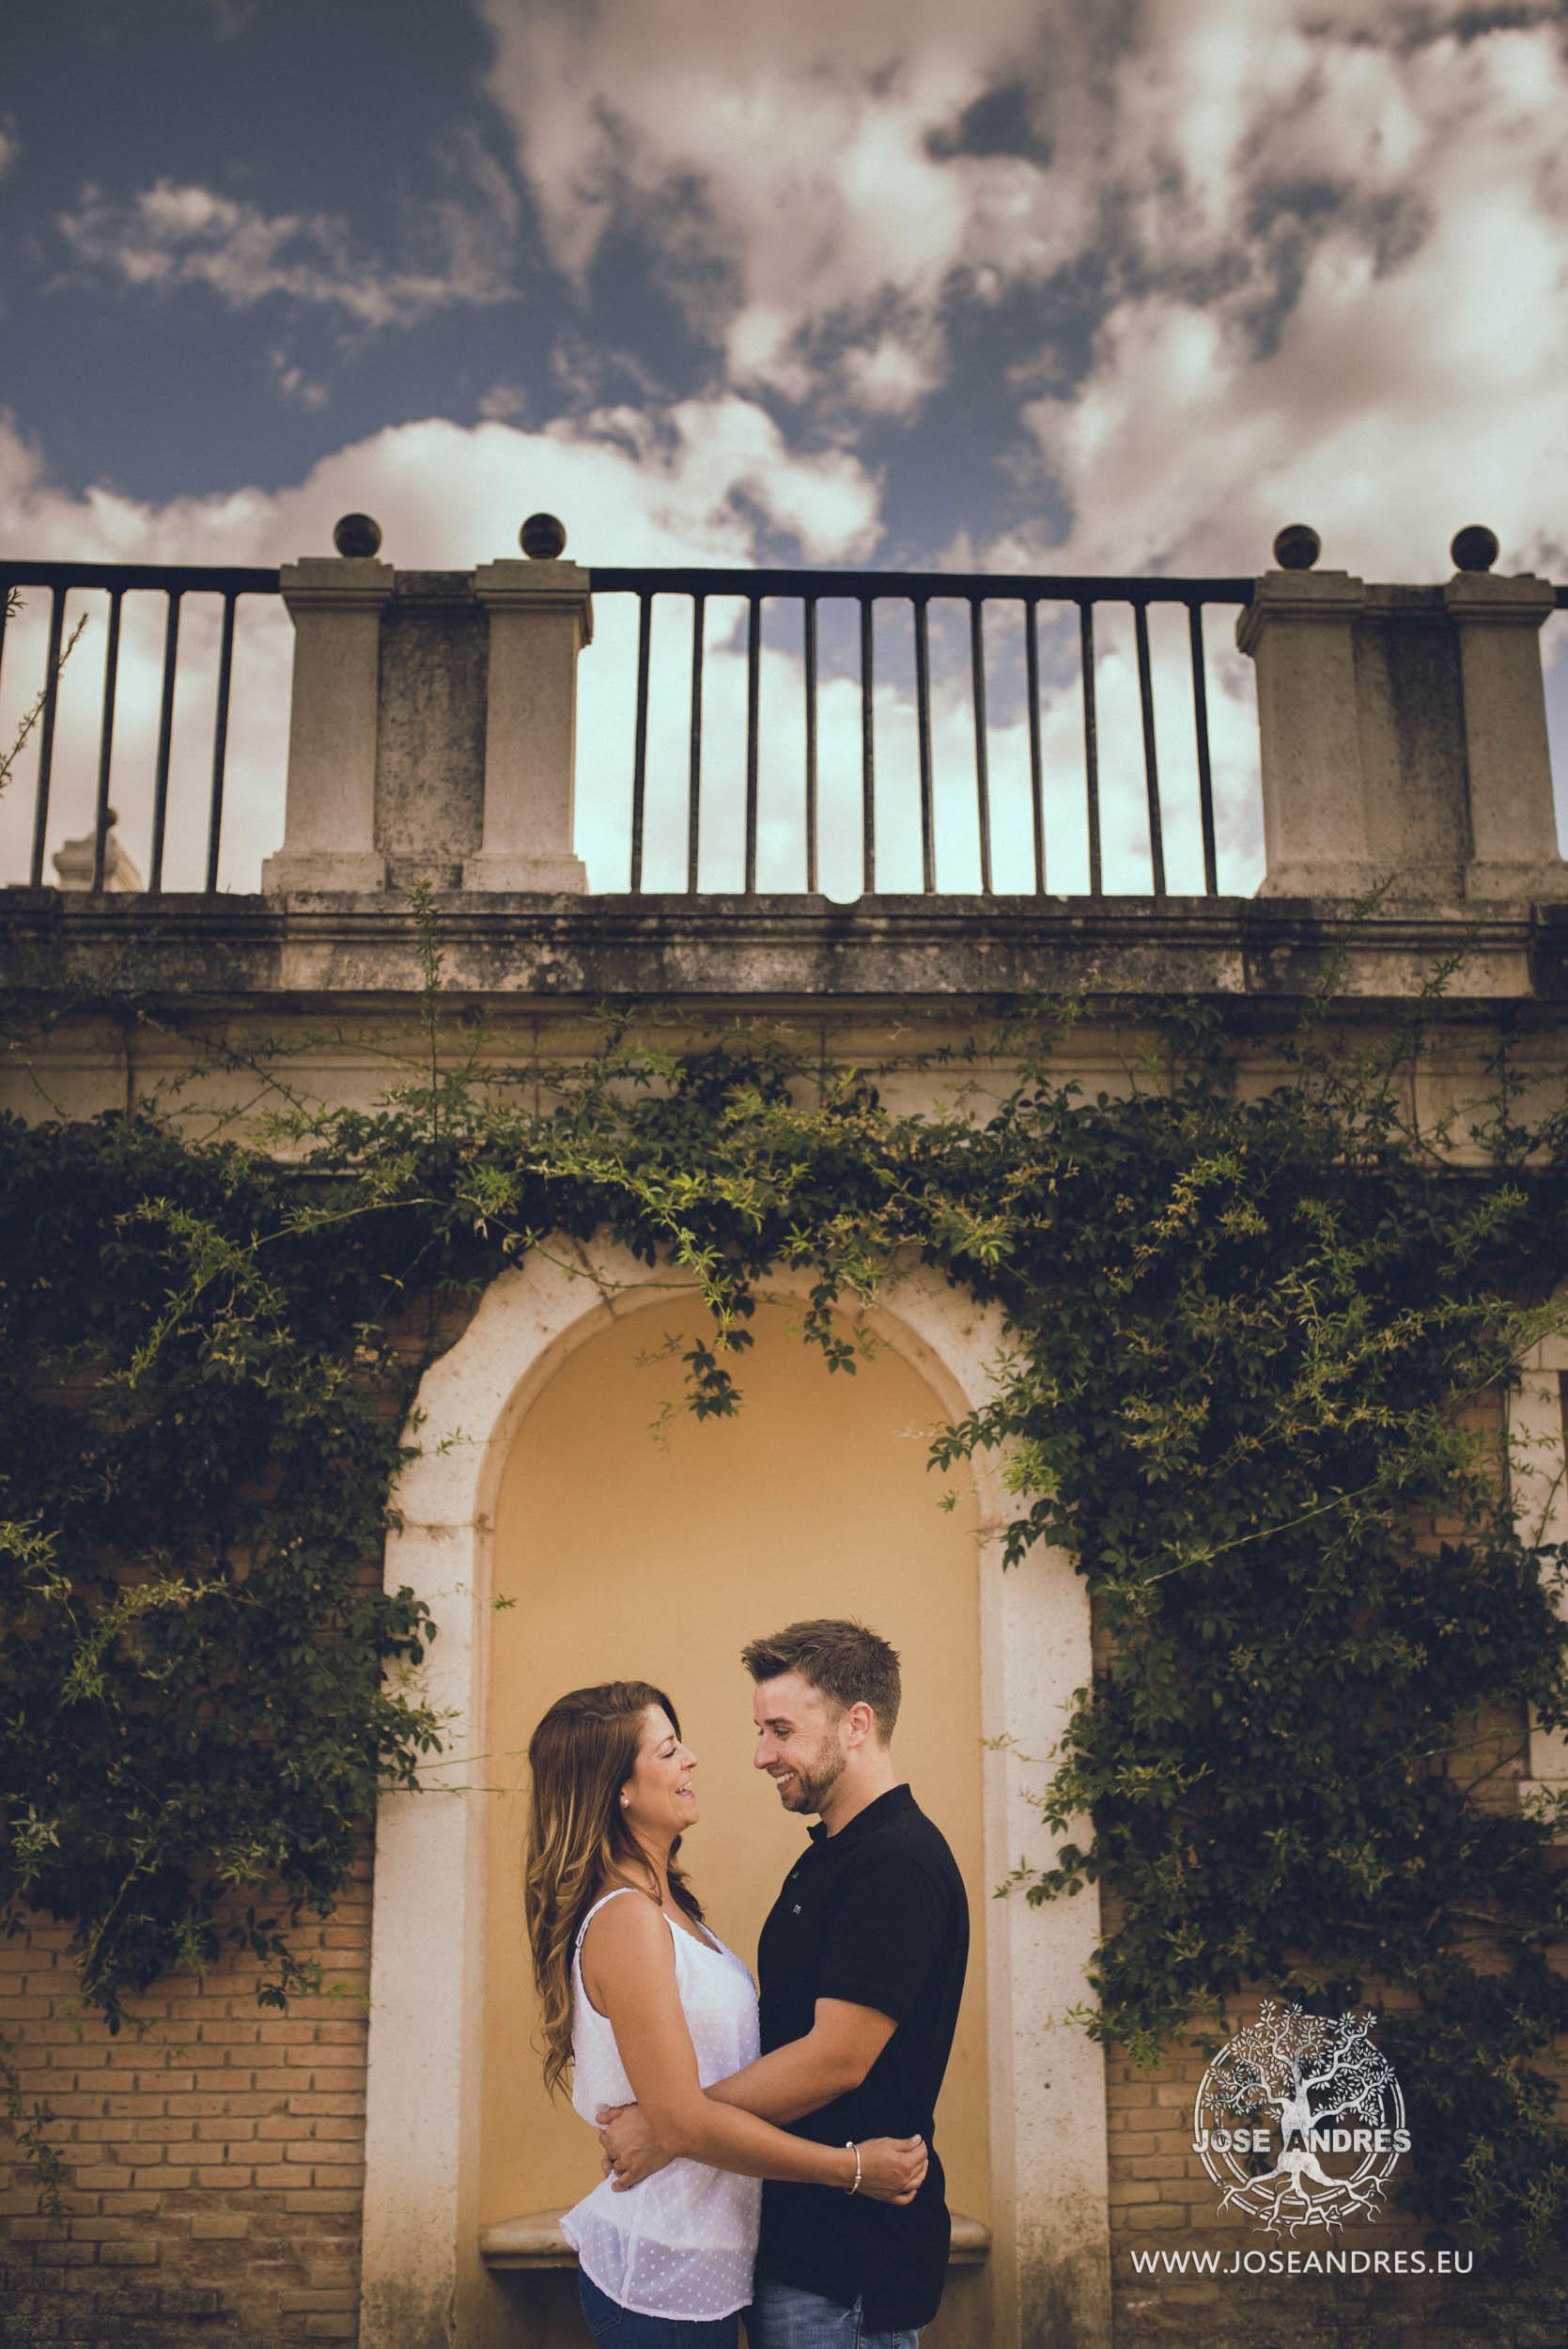 Preboda en Aranjuez, , fotografía de boda Aranjuez, campos de Aranjuez, fotógrafo de boda en Aranjuez, vídeo de boda Aranjuez